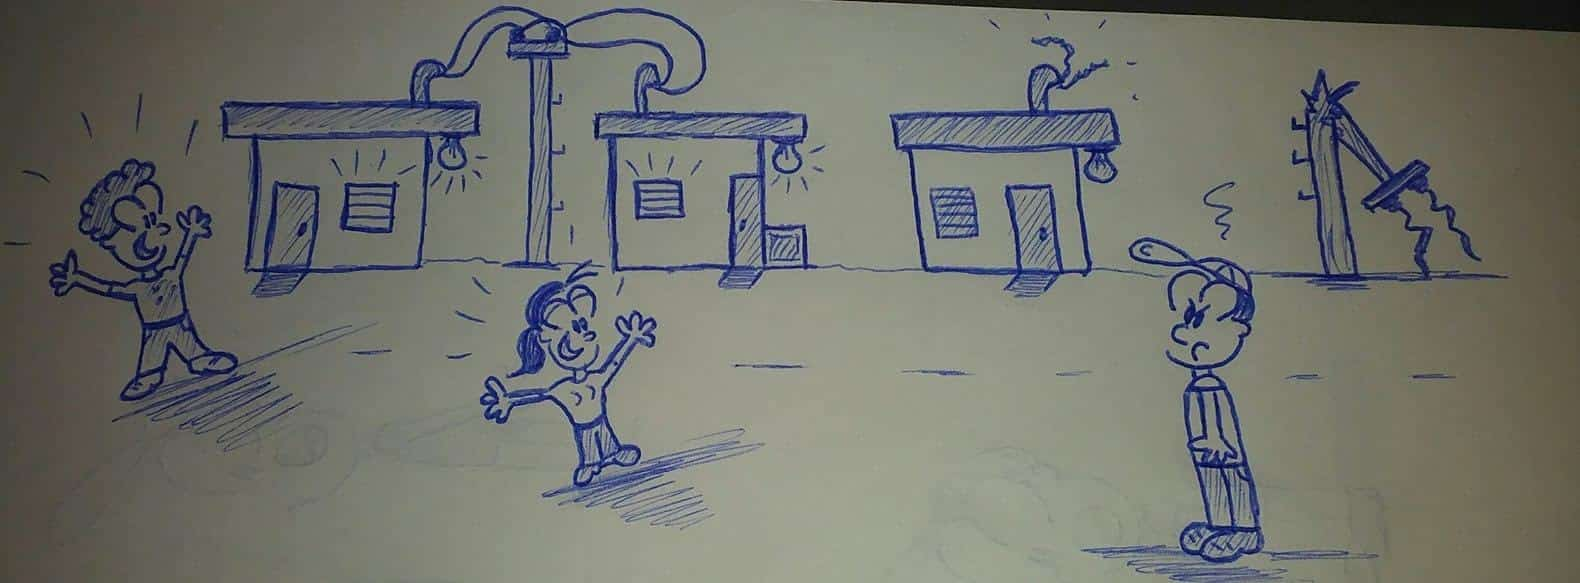 caricaturas frente a casas